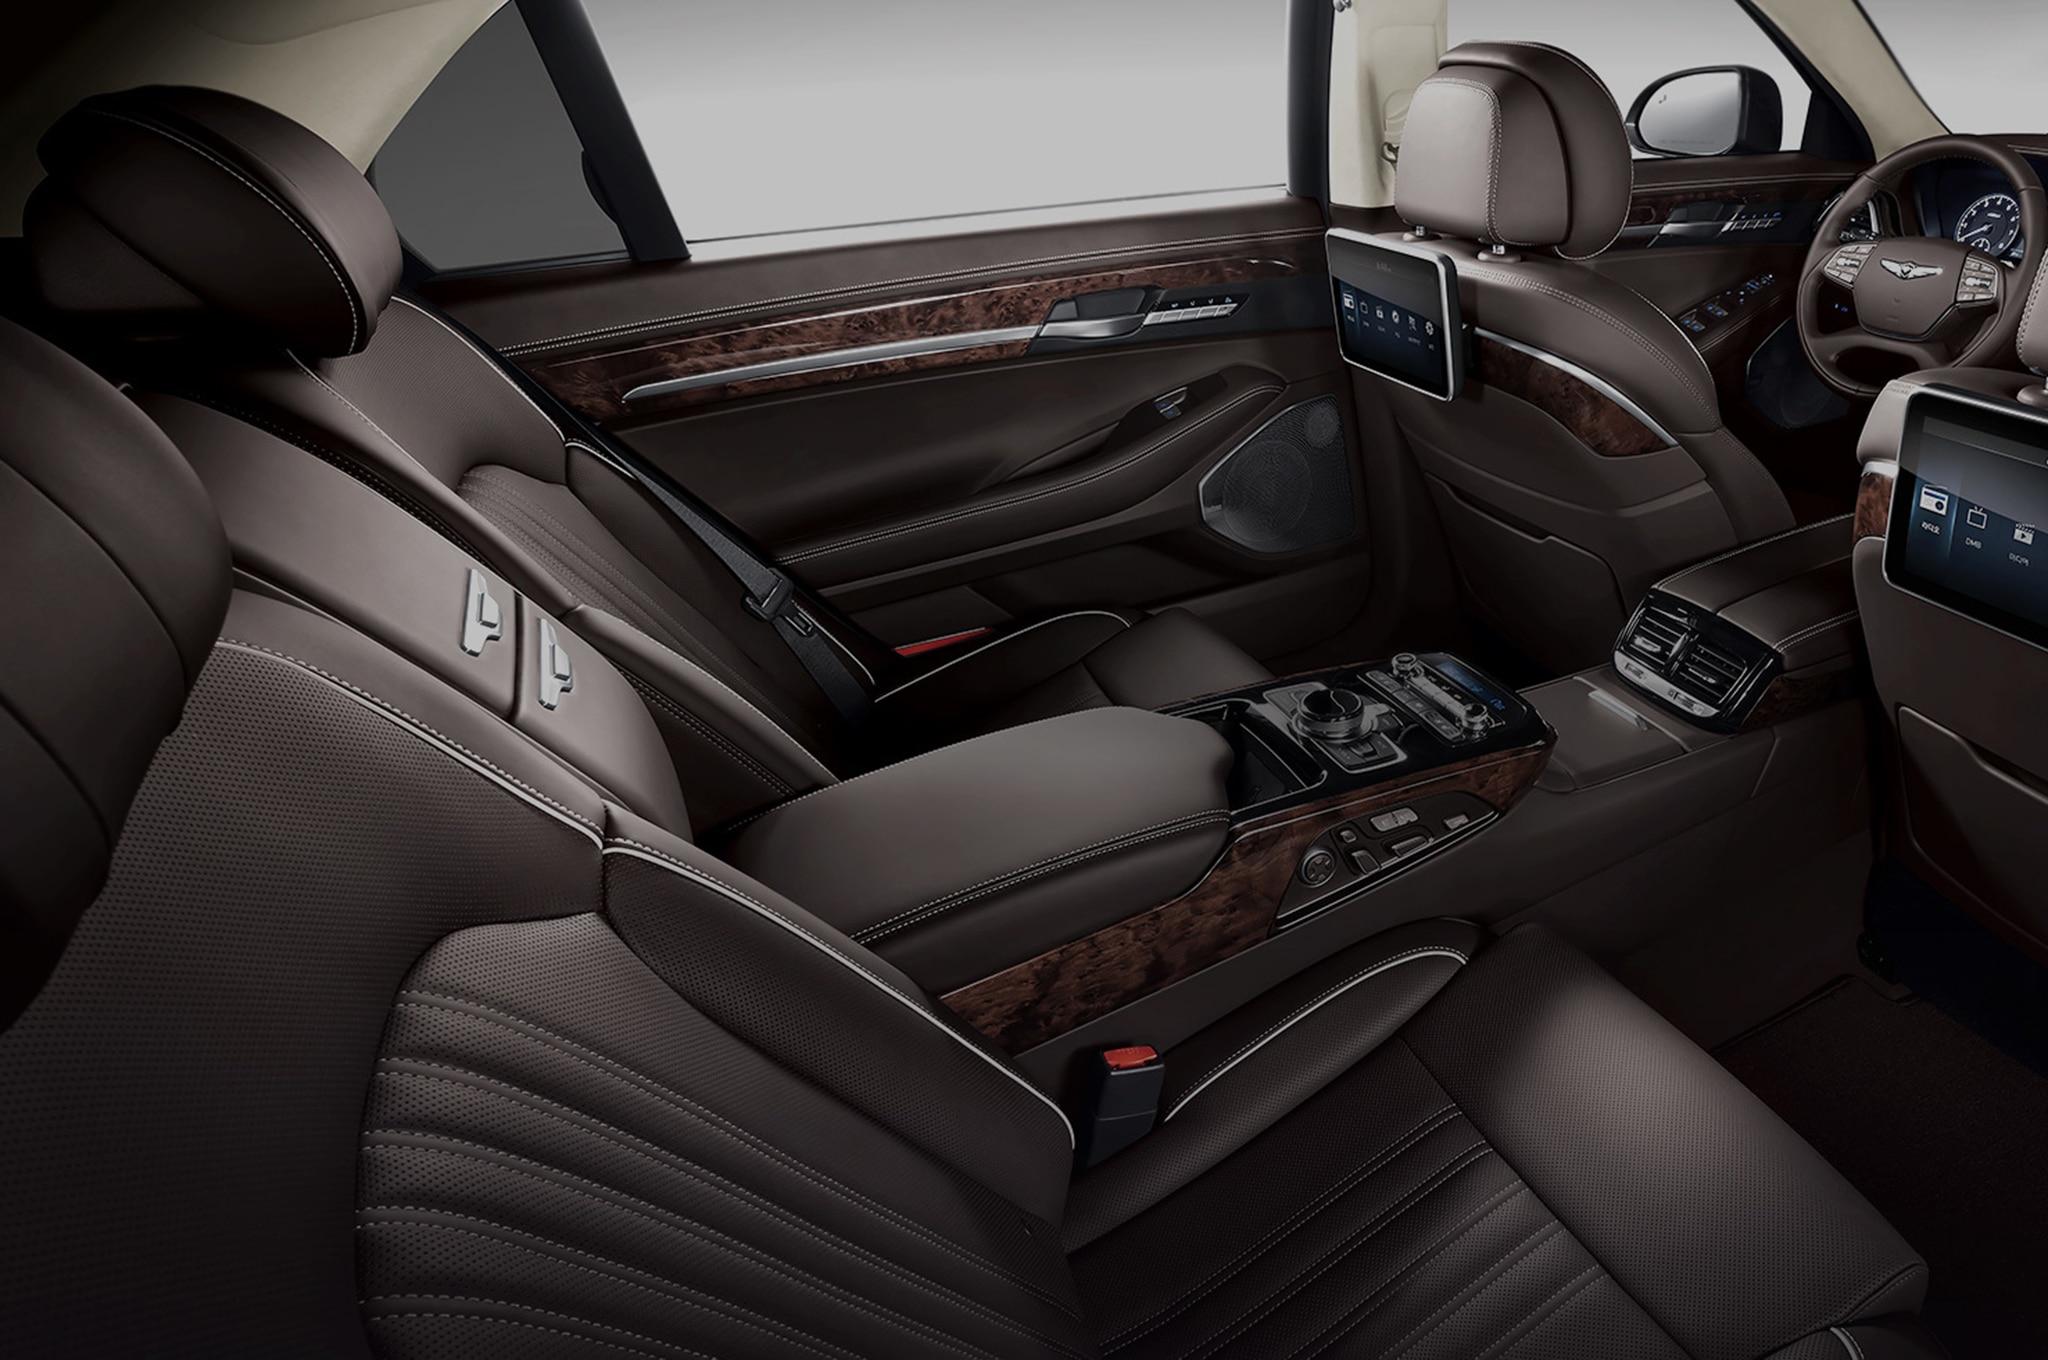 2017 Genesis G90 Luxury Sedan Revealed to Take on S-Class ...